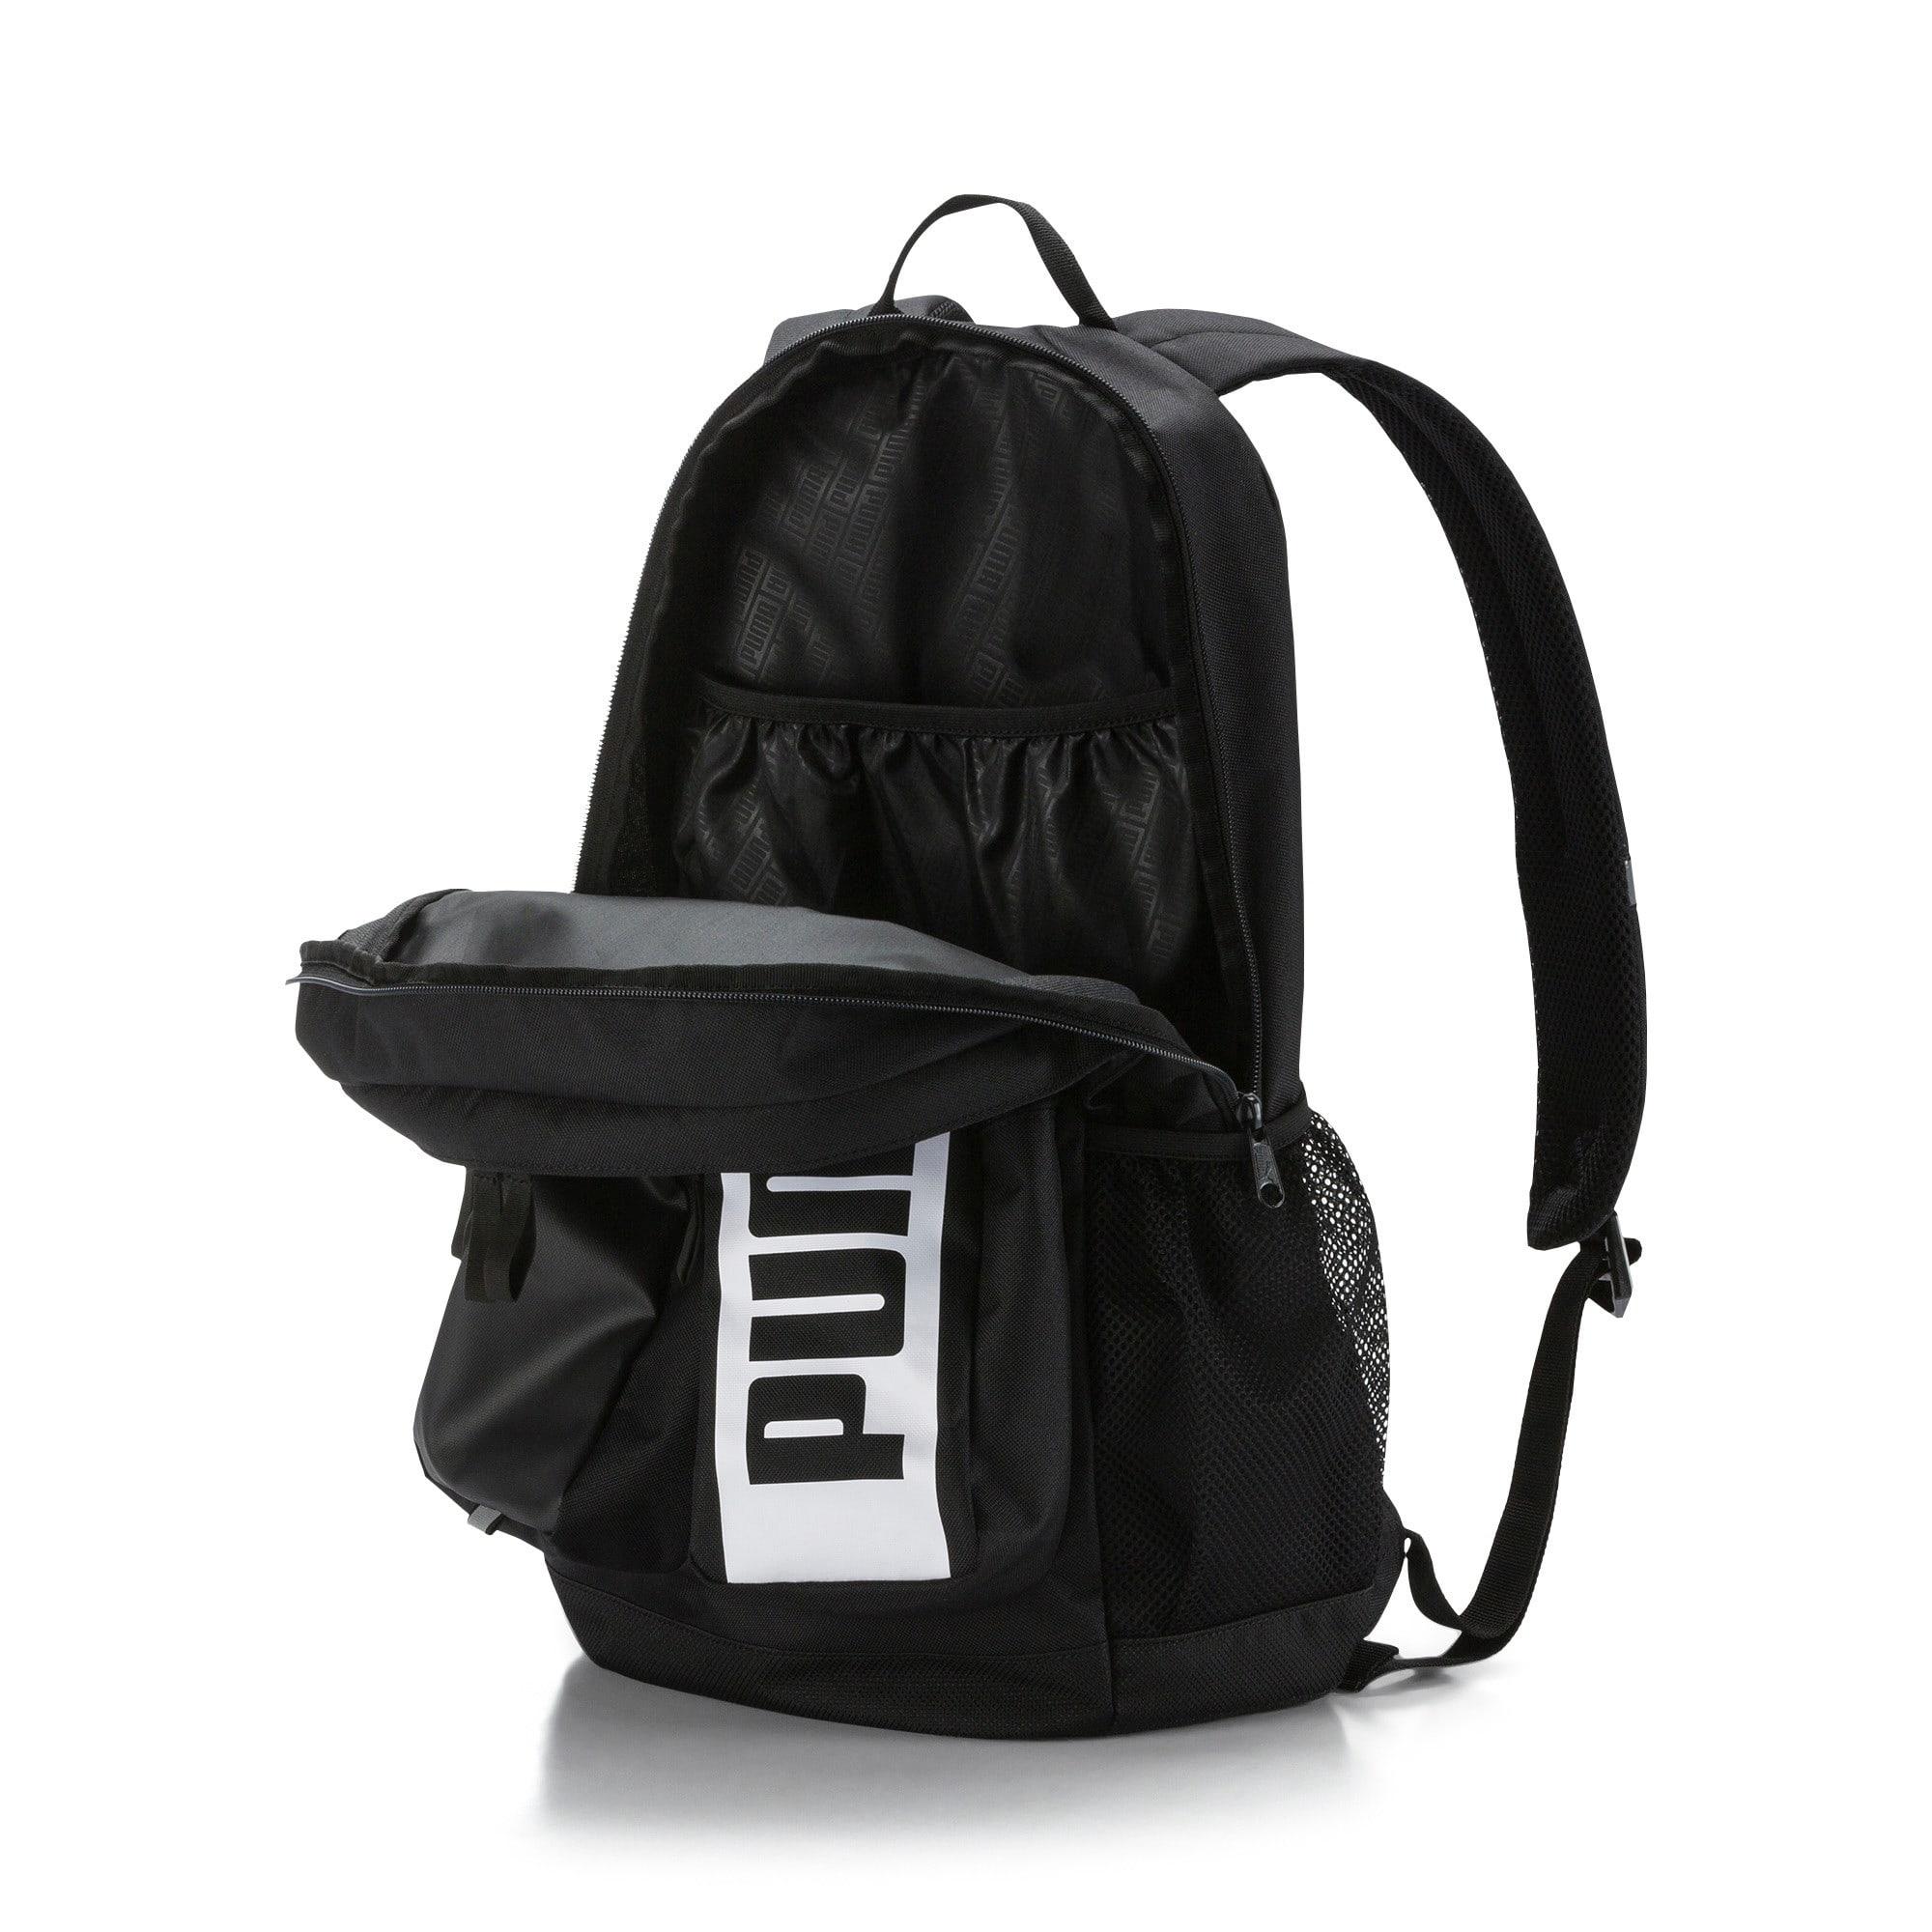 Thumbnail 4 of Deck Backpack II, Puma Black, medium